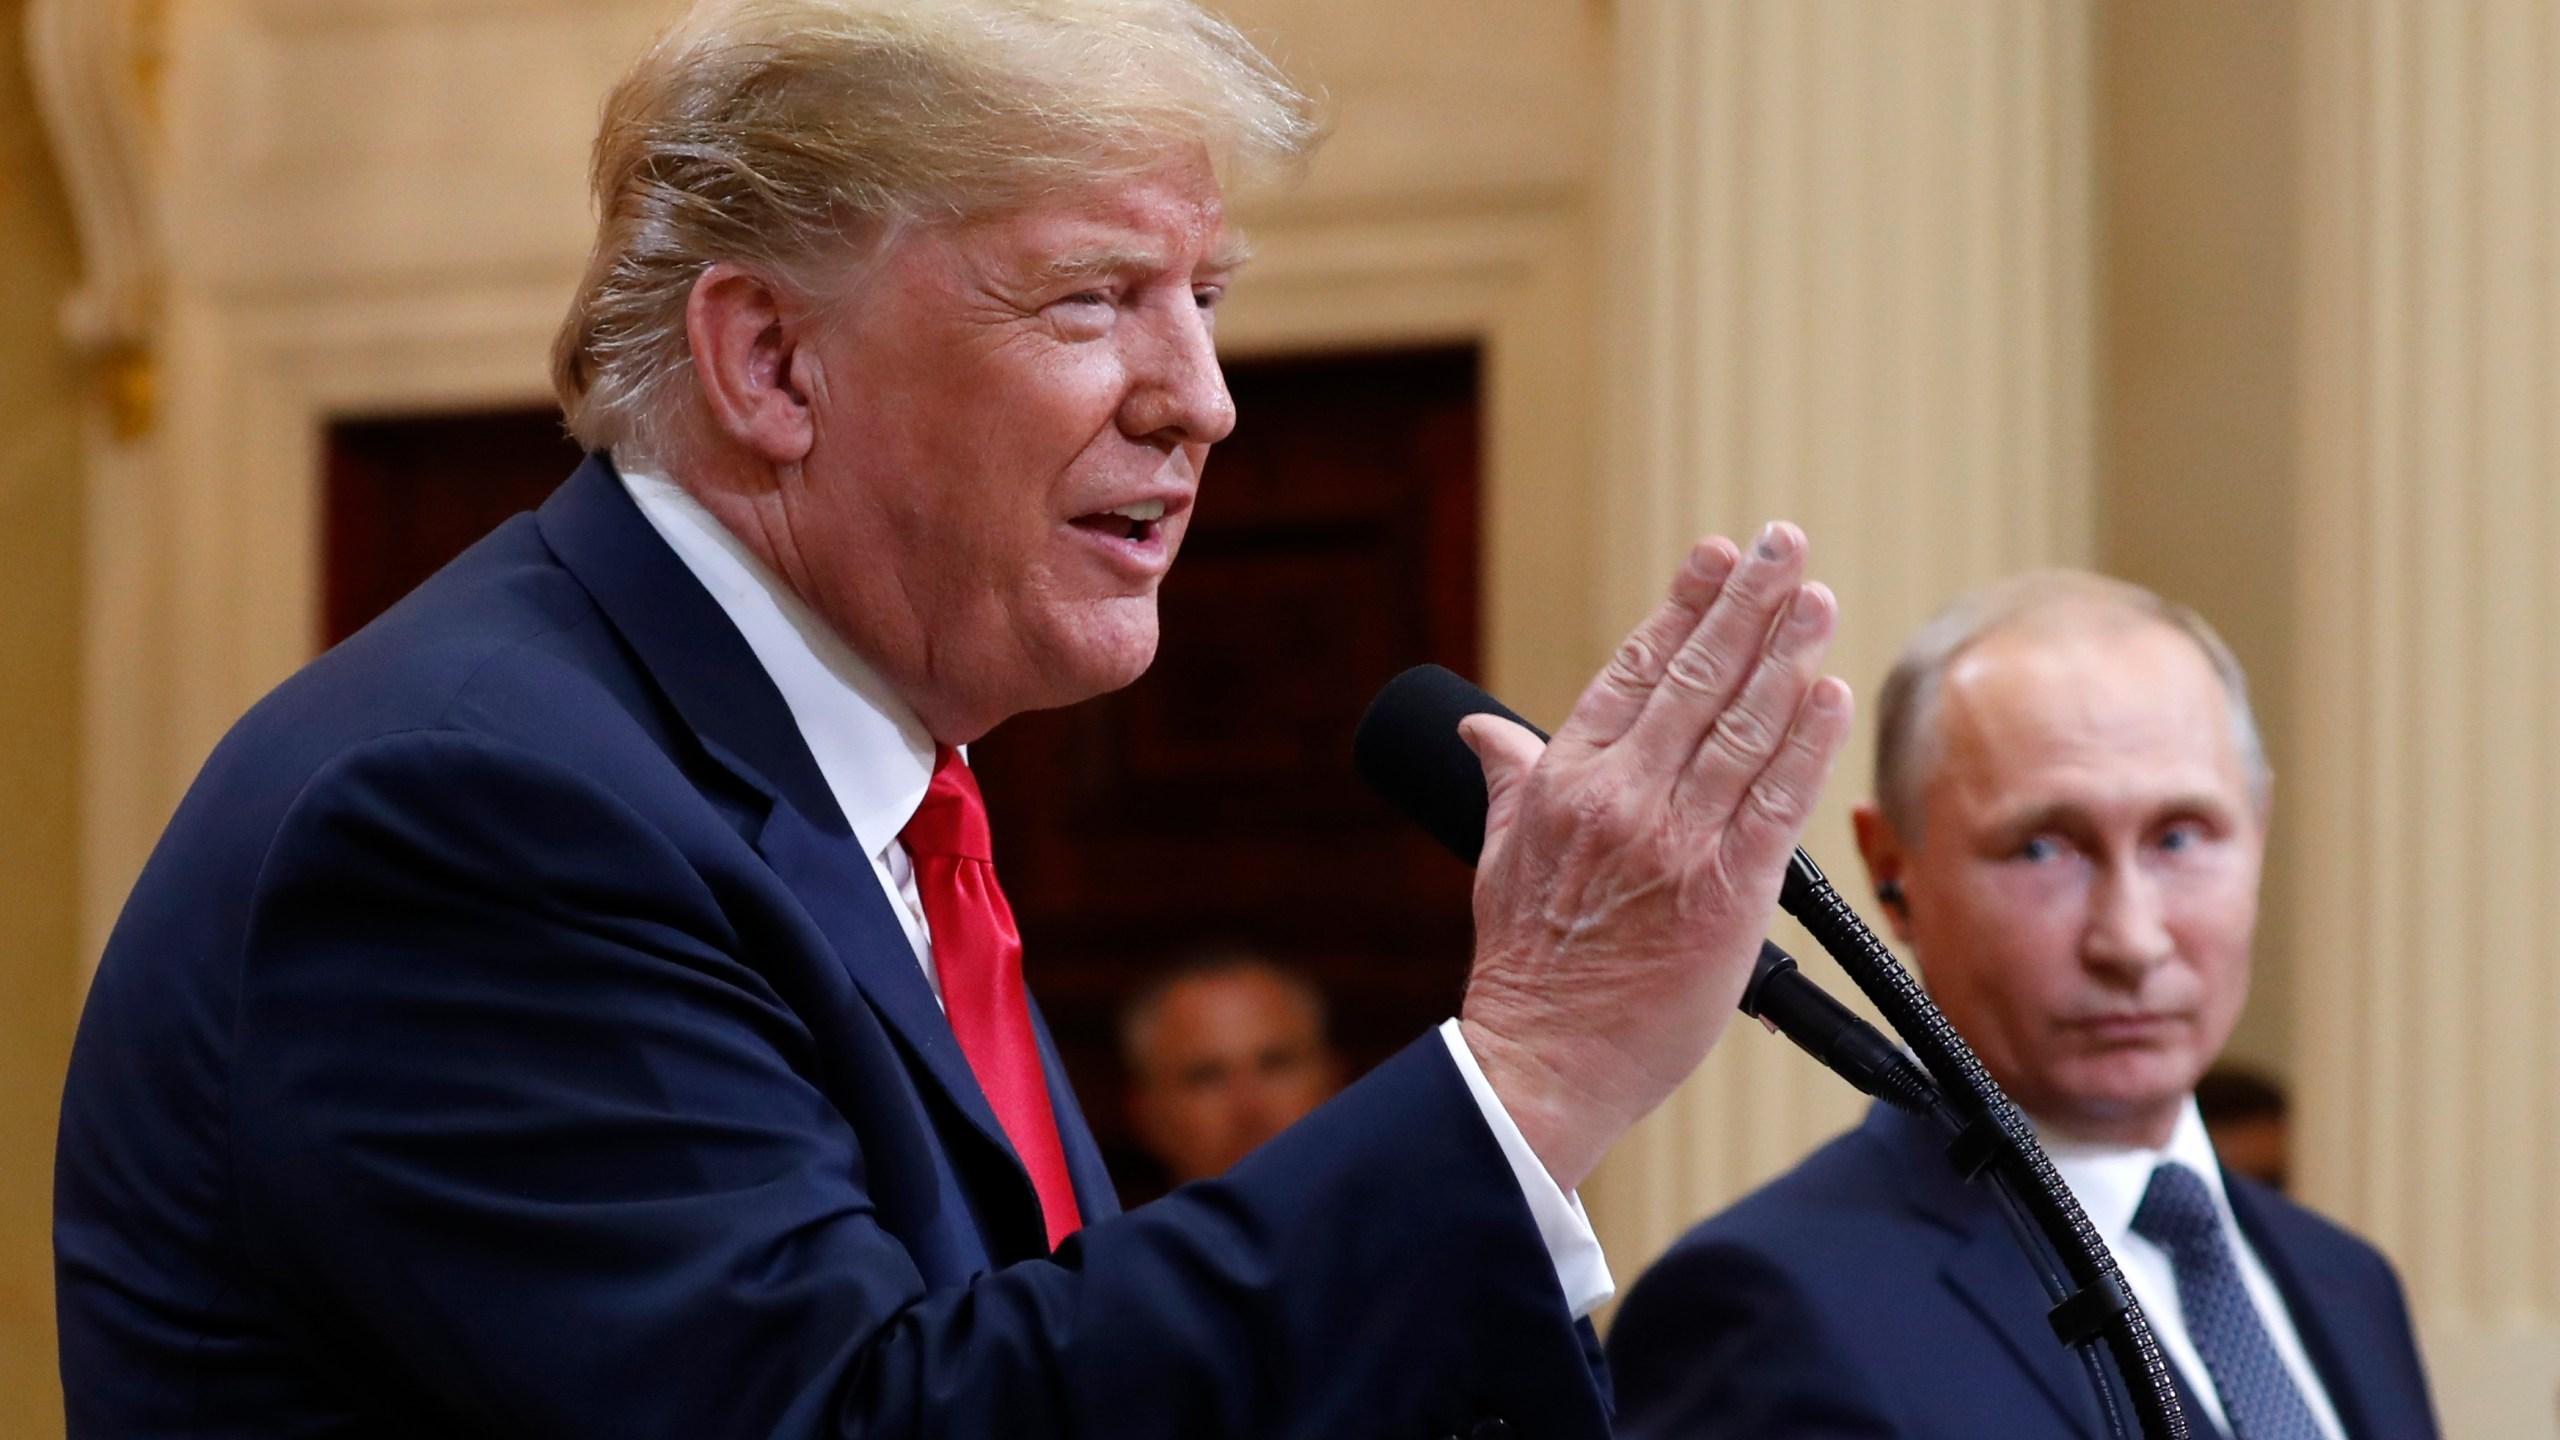 APTOPIX_Finland_Trump_Putin_Summit_36592-159532.jpg28548872